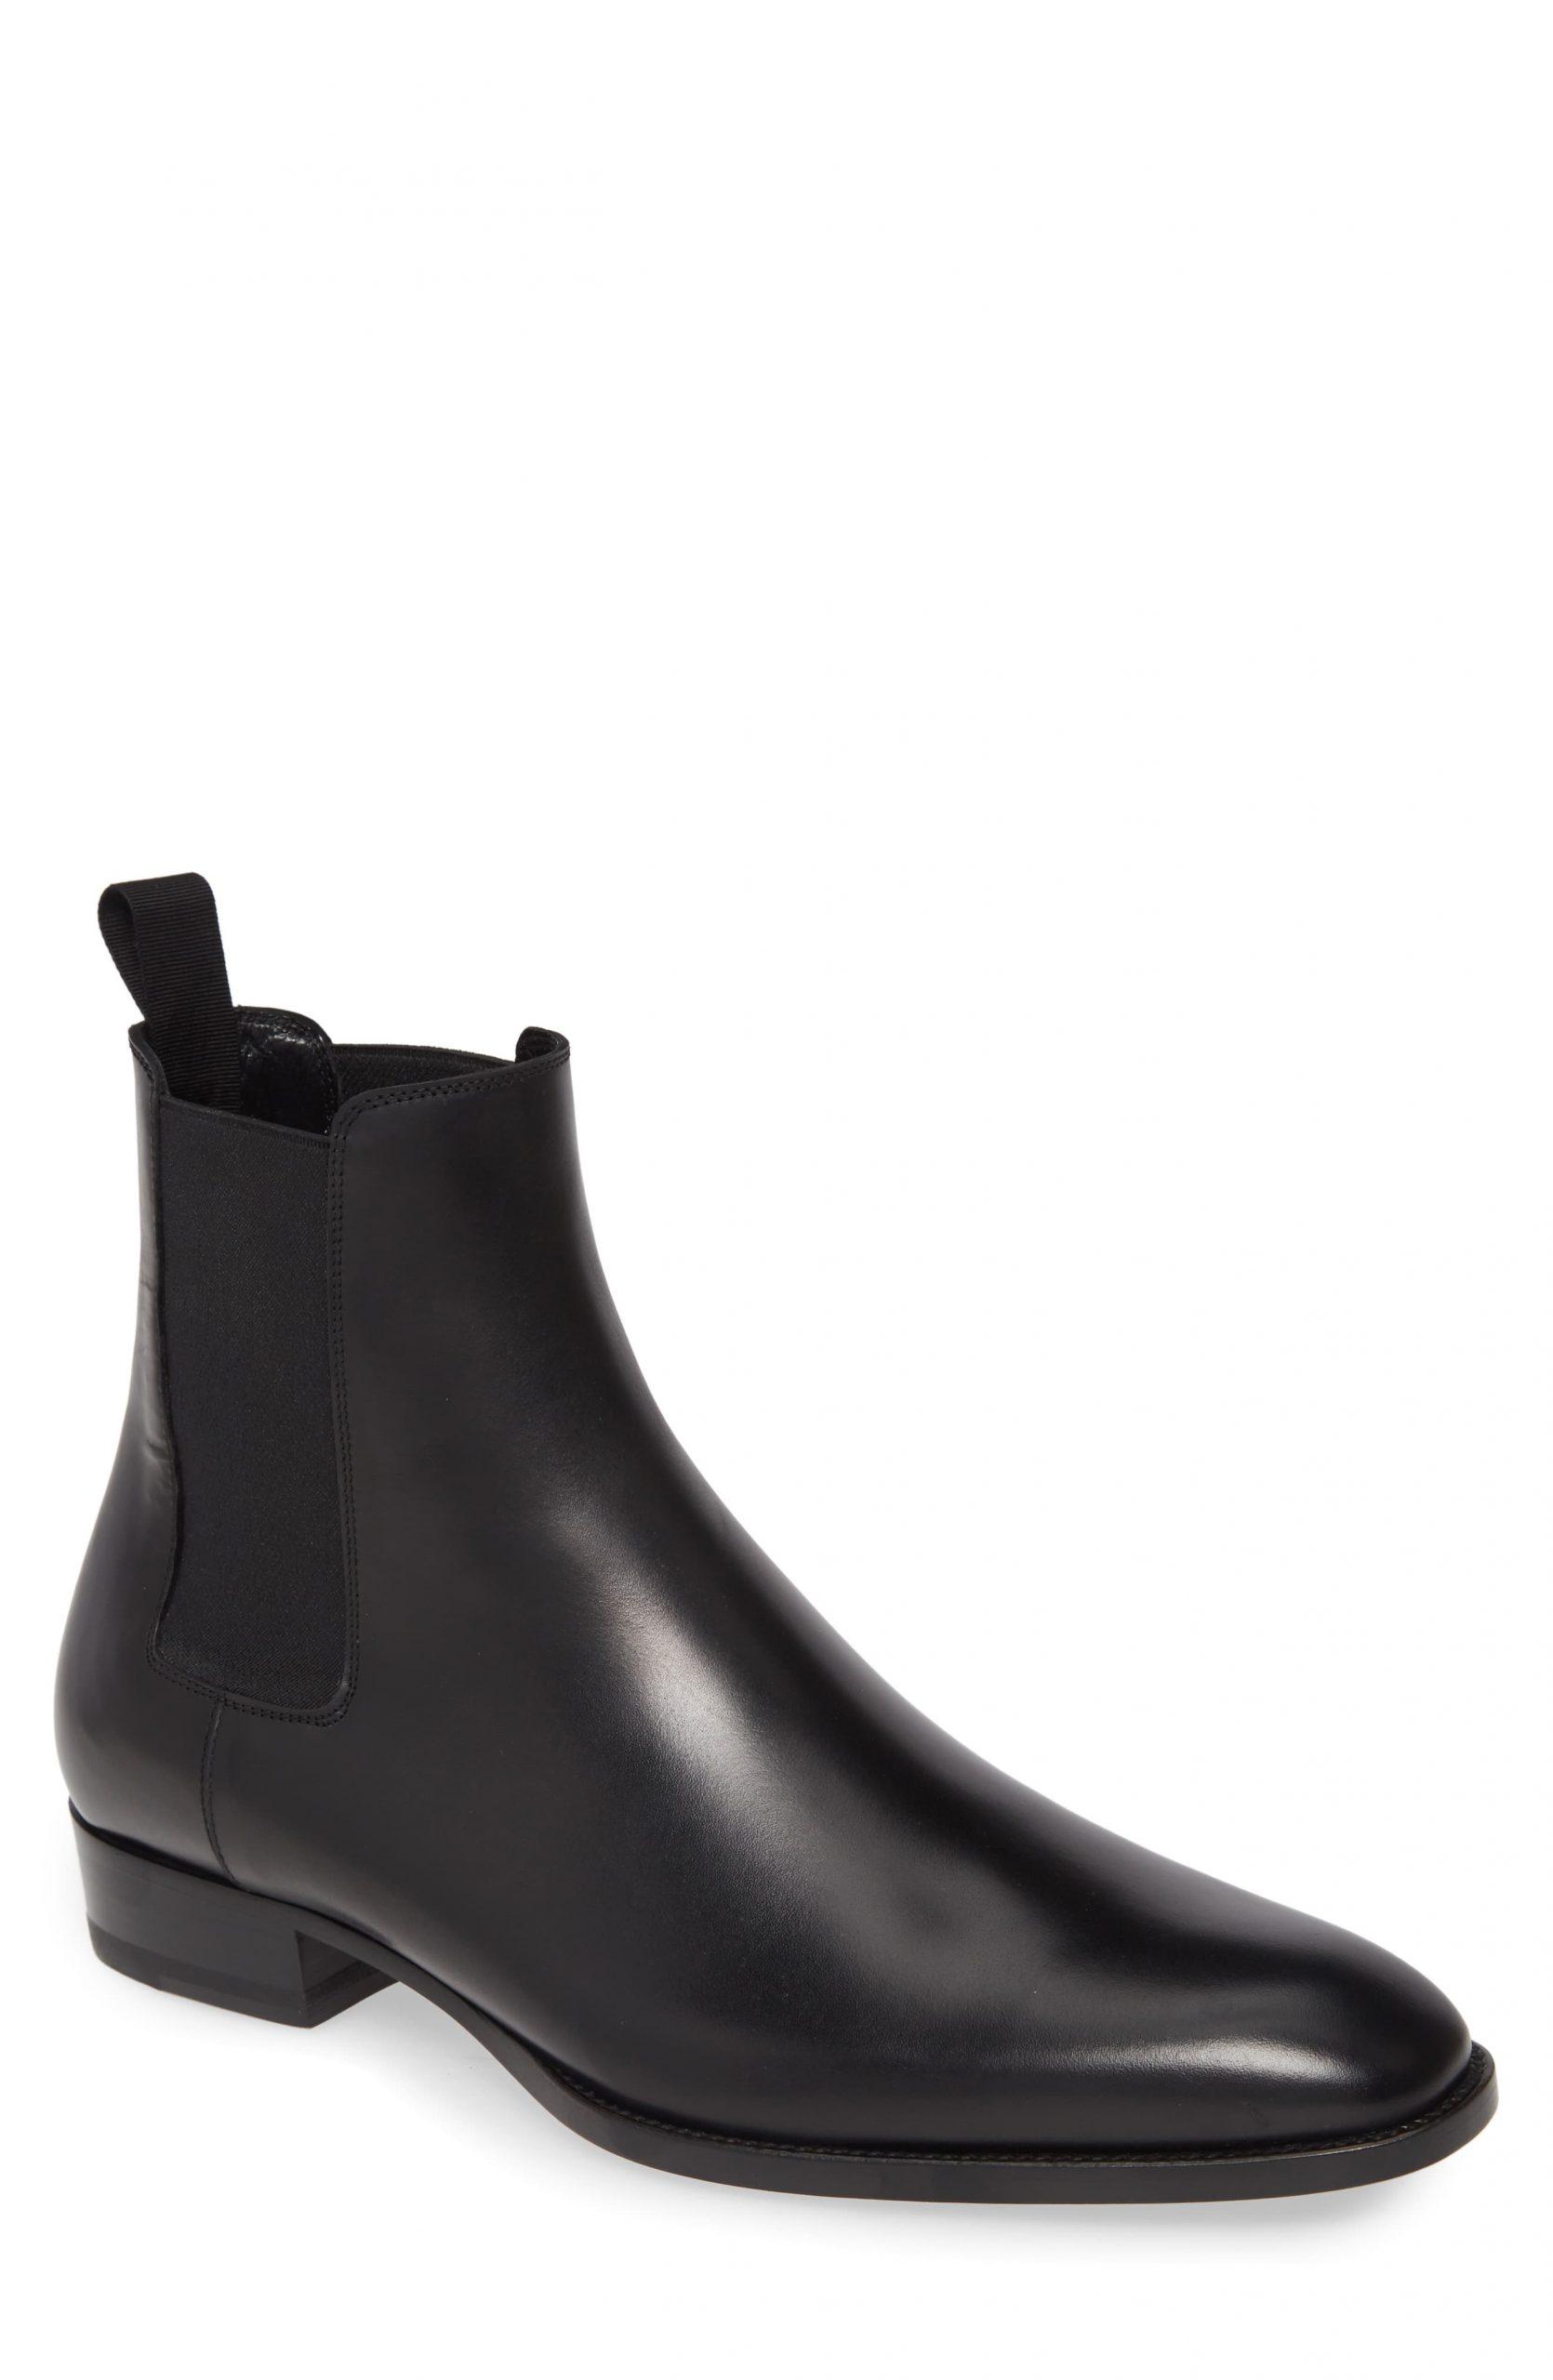 Men's Saint Laurent Chelsea Boot, Size